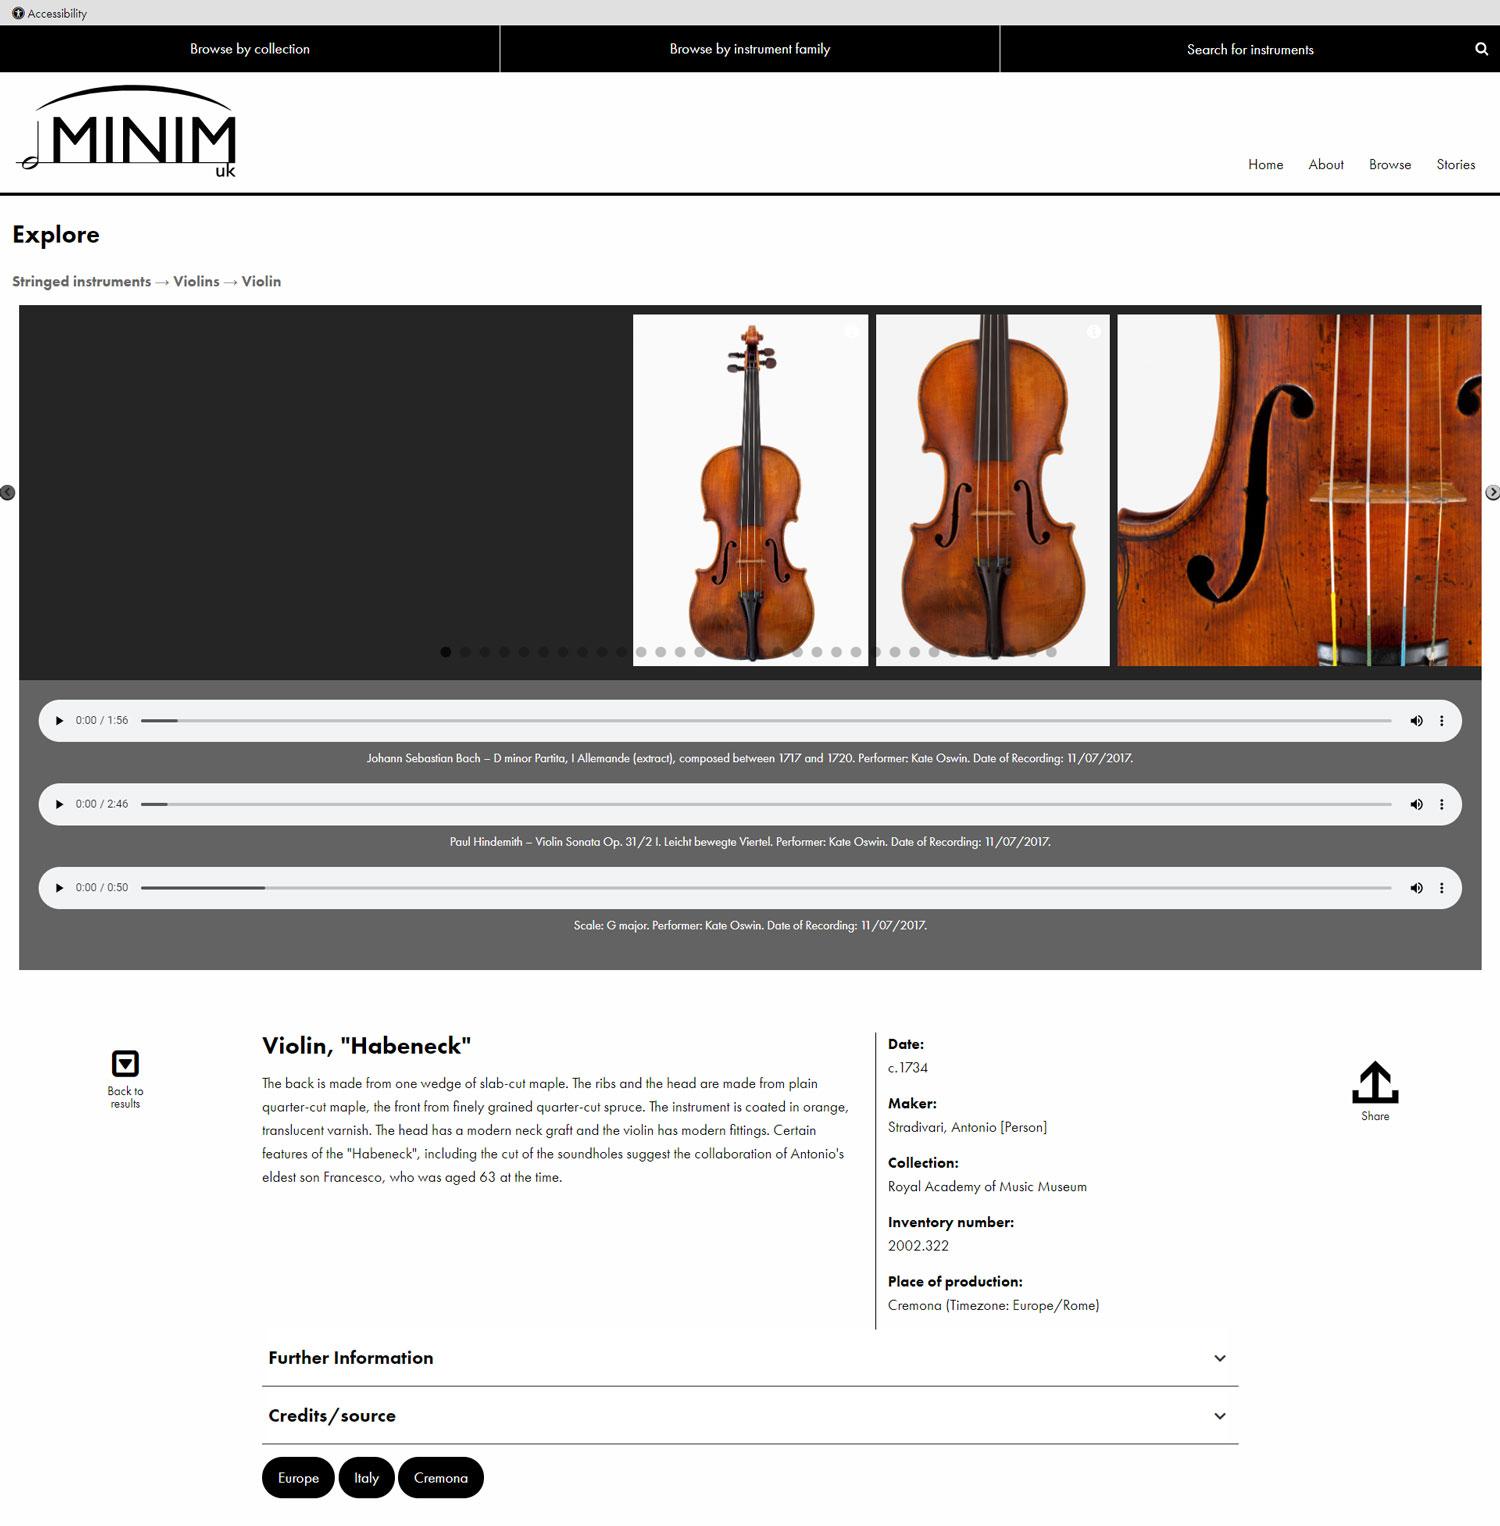 "Screenshot of MINIM UK website - Violin, ""Habernak"" collection object"